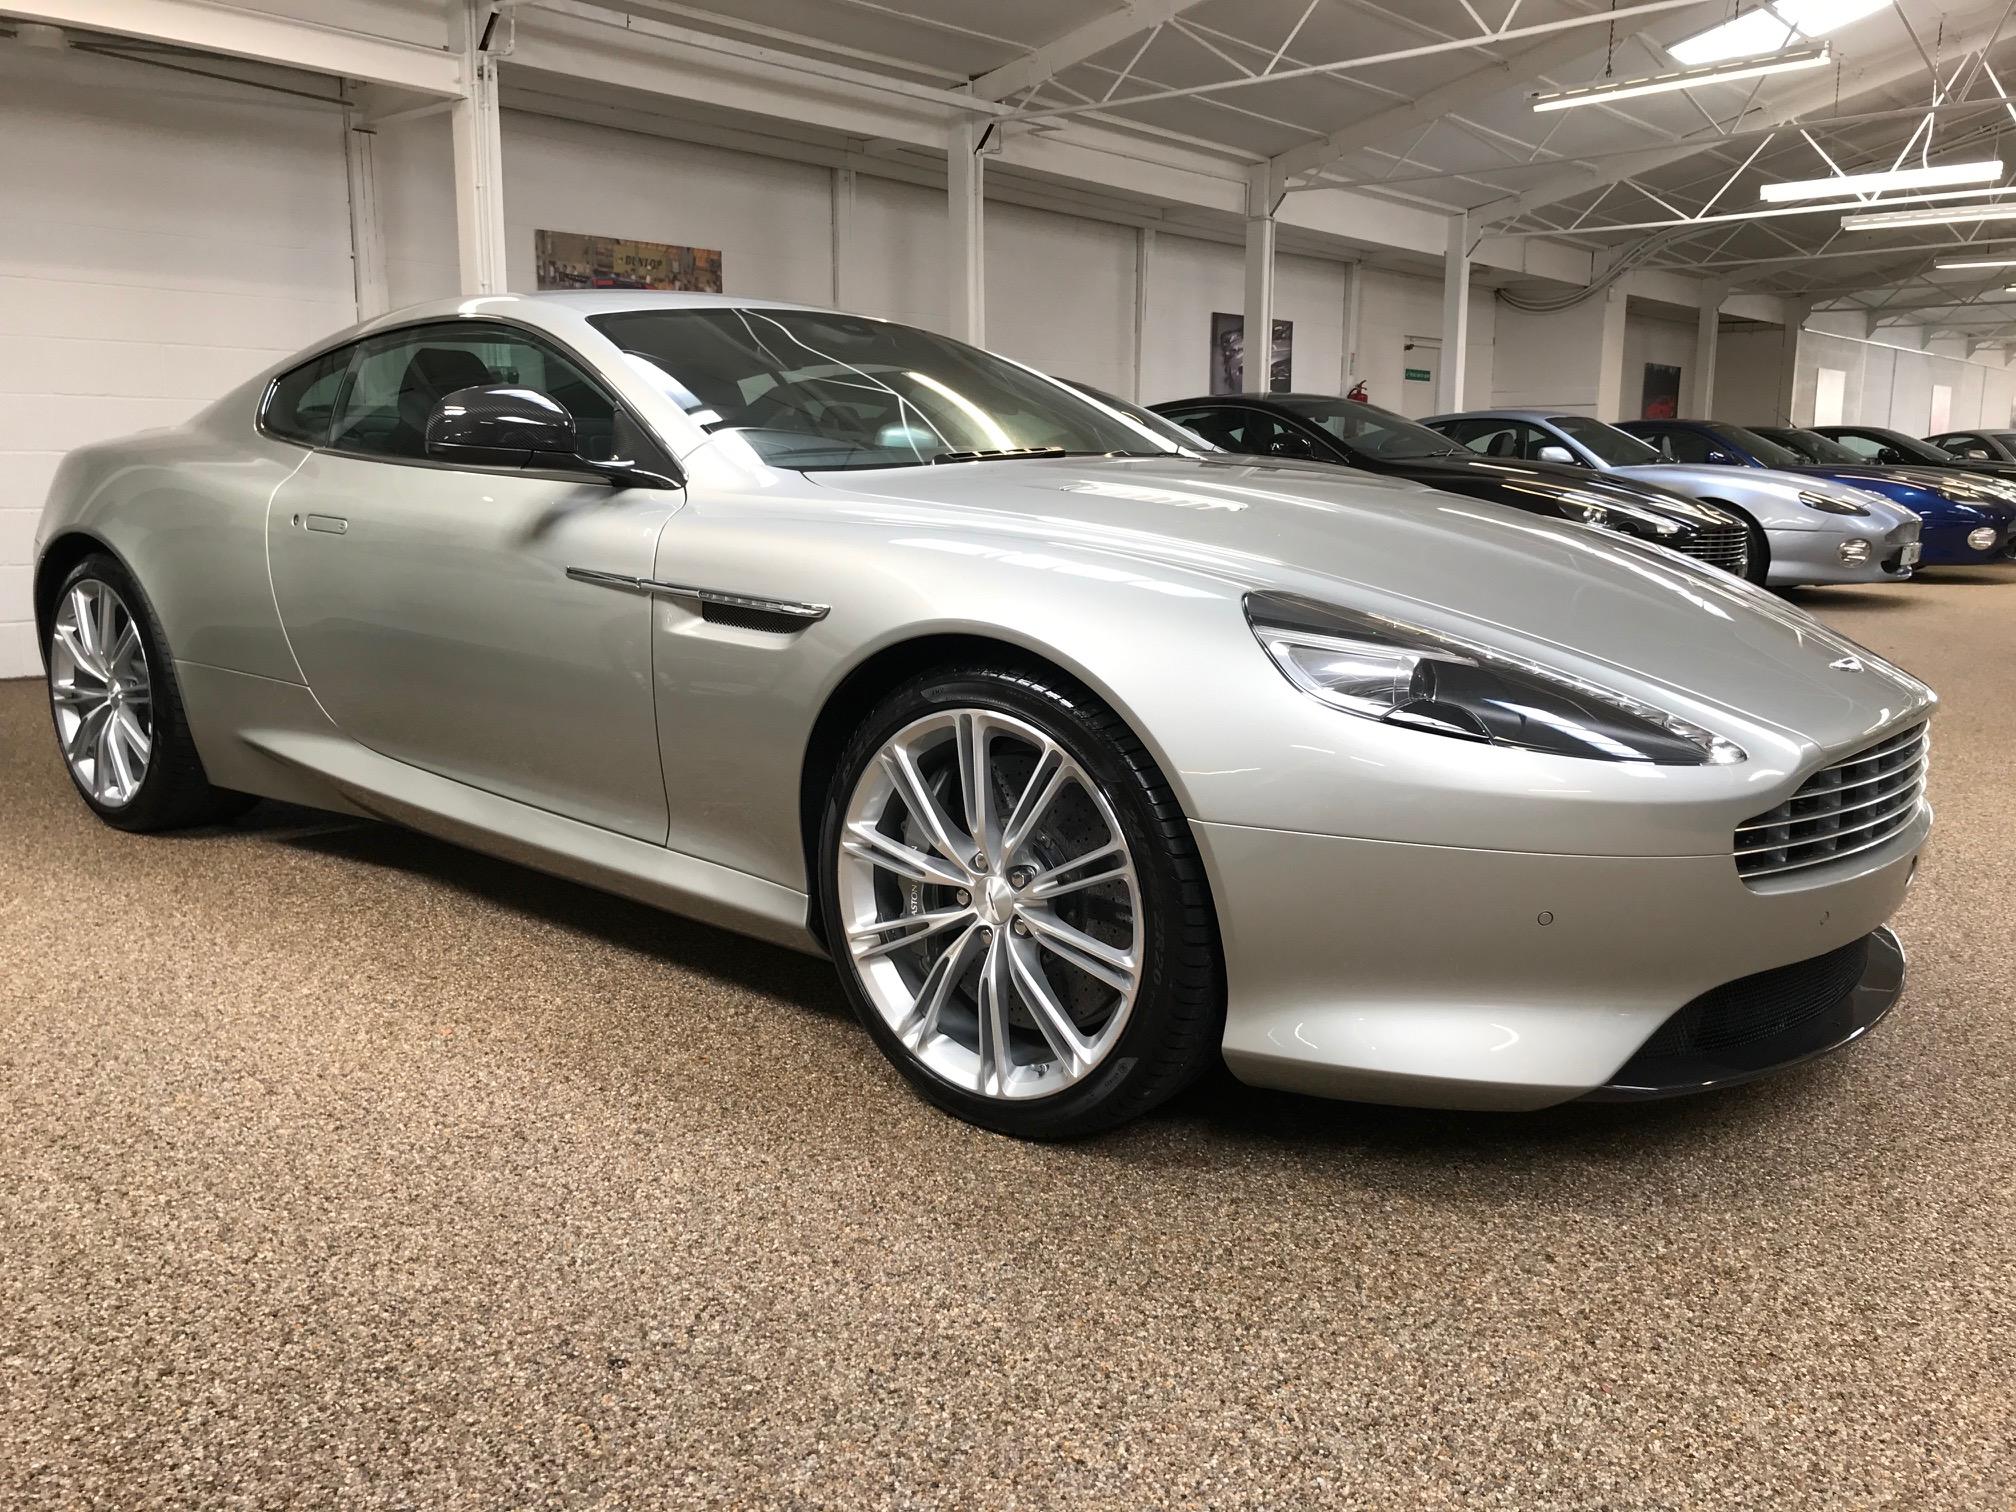 Aston Martin DB9 2012